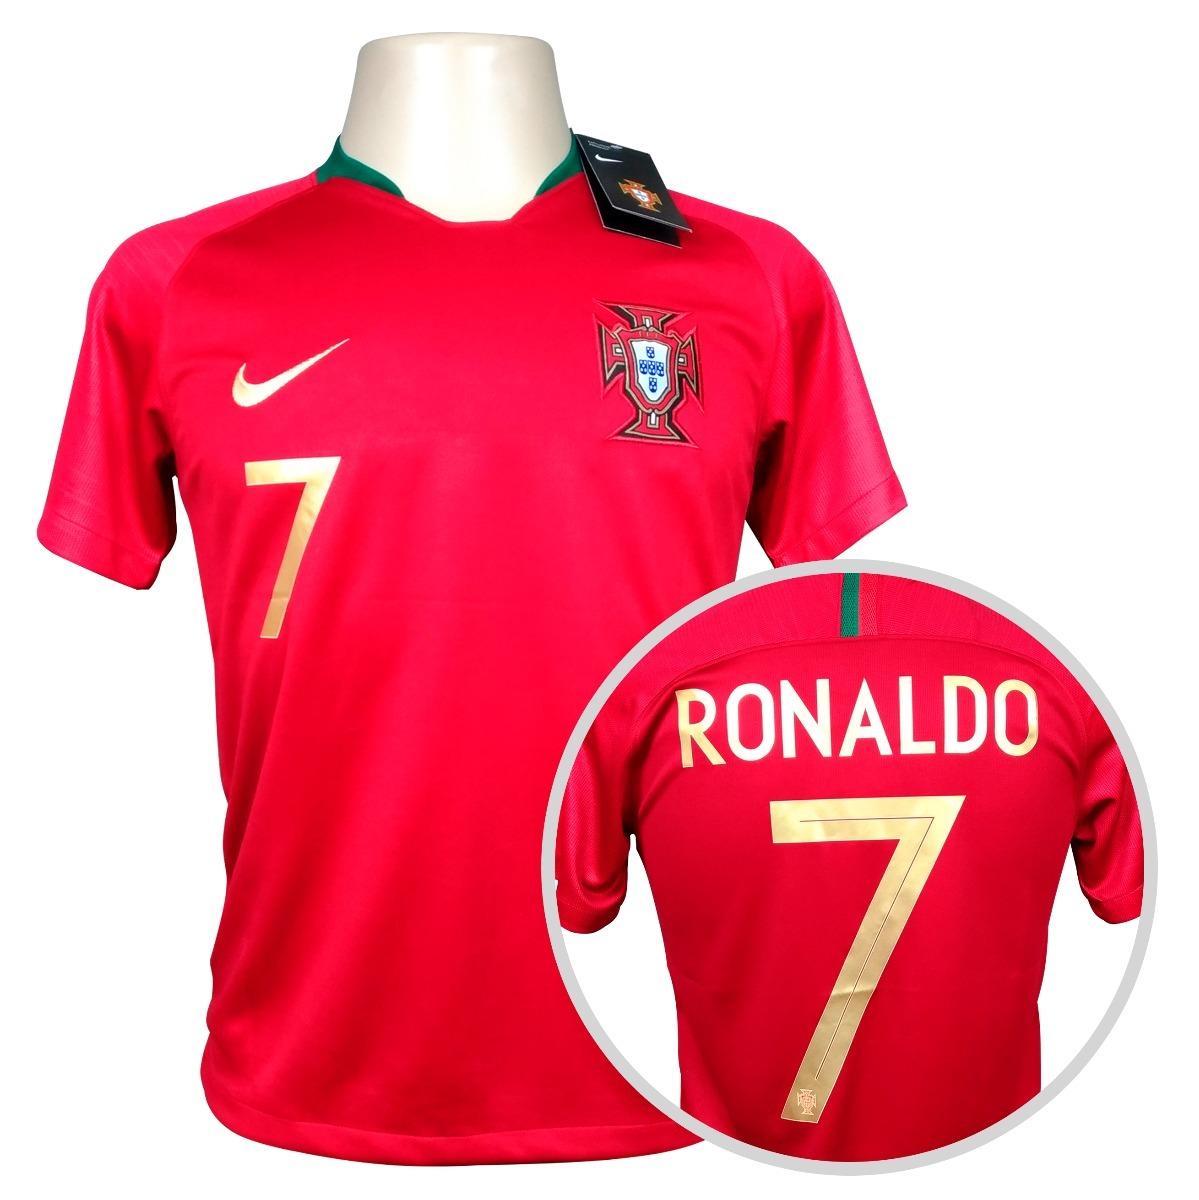 camisa portugal titular copa 2018  7 ronaldo. Carregando zoom. bc7cc2959ed9b